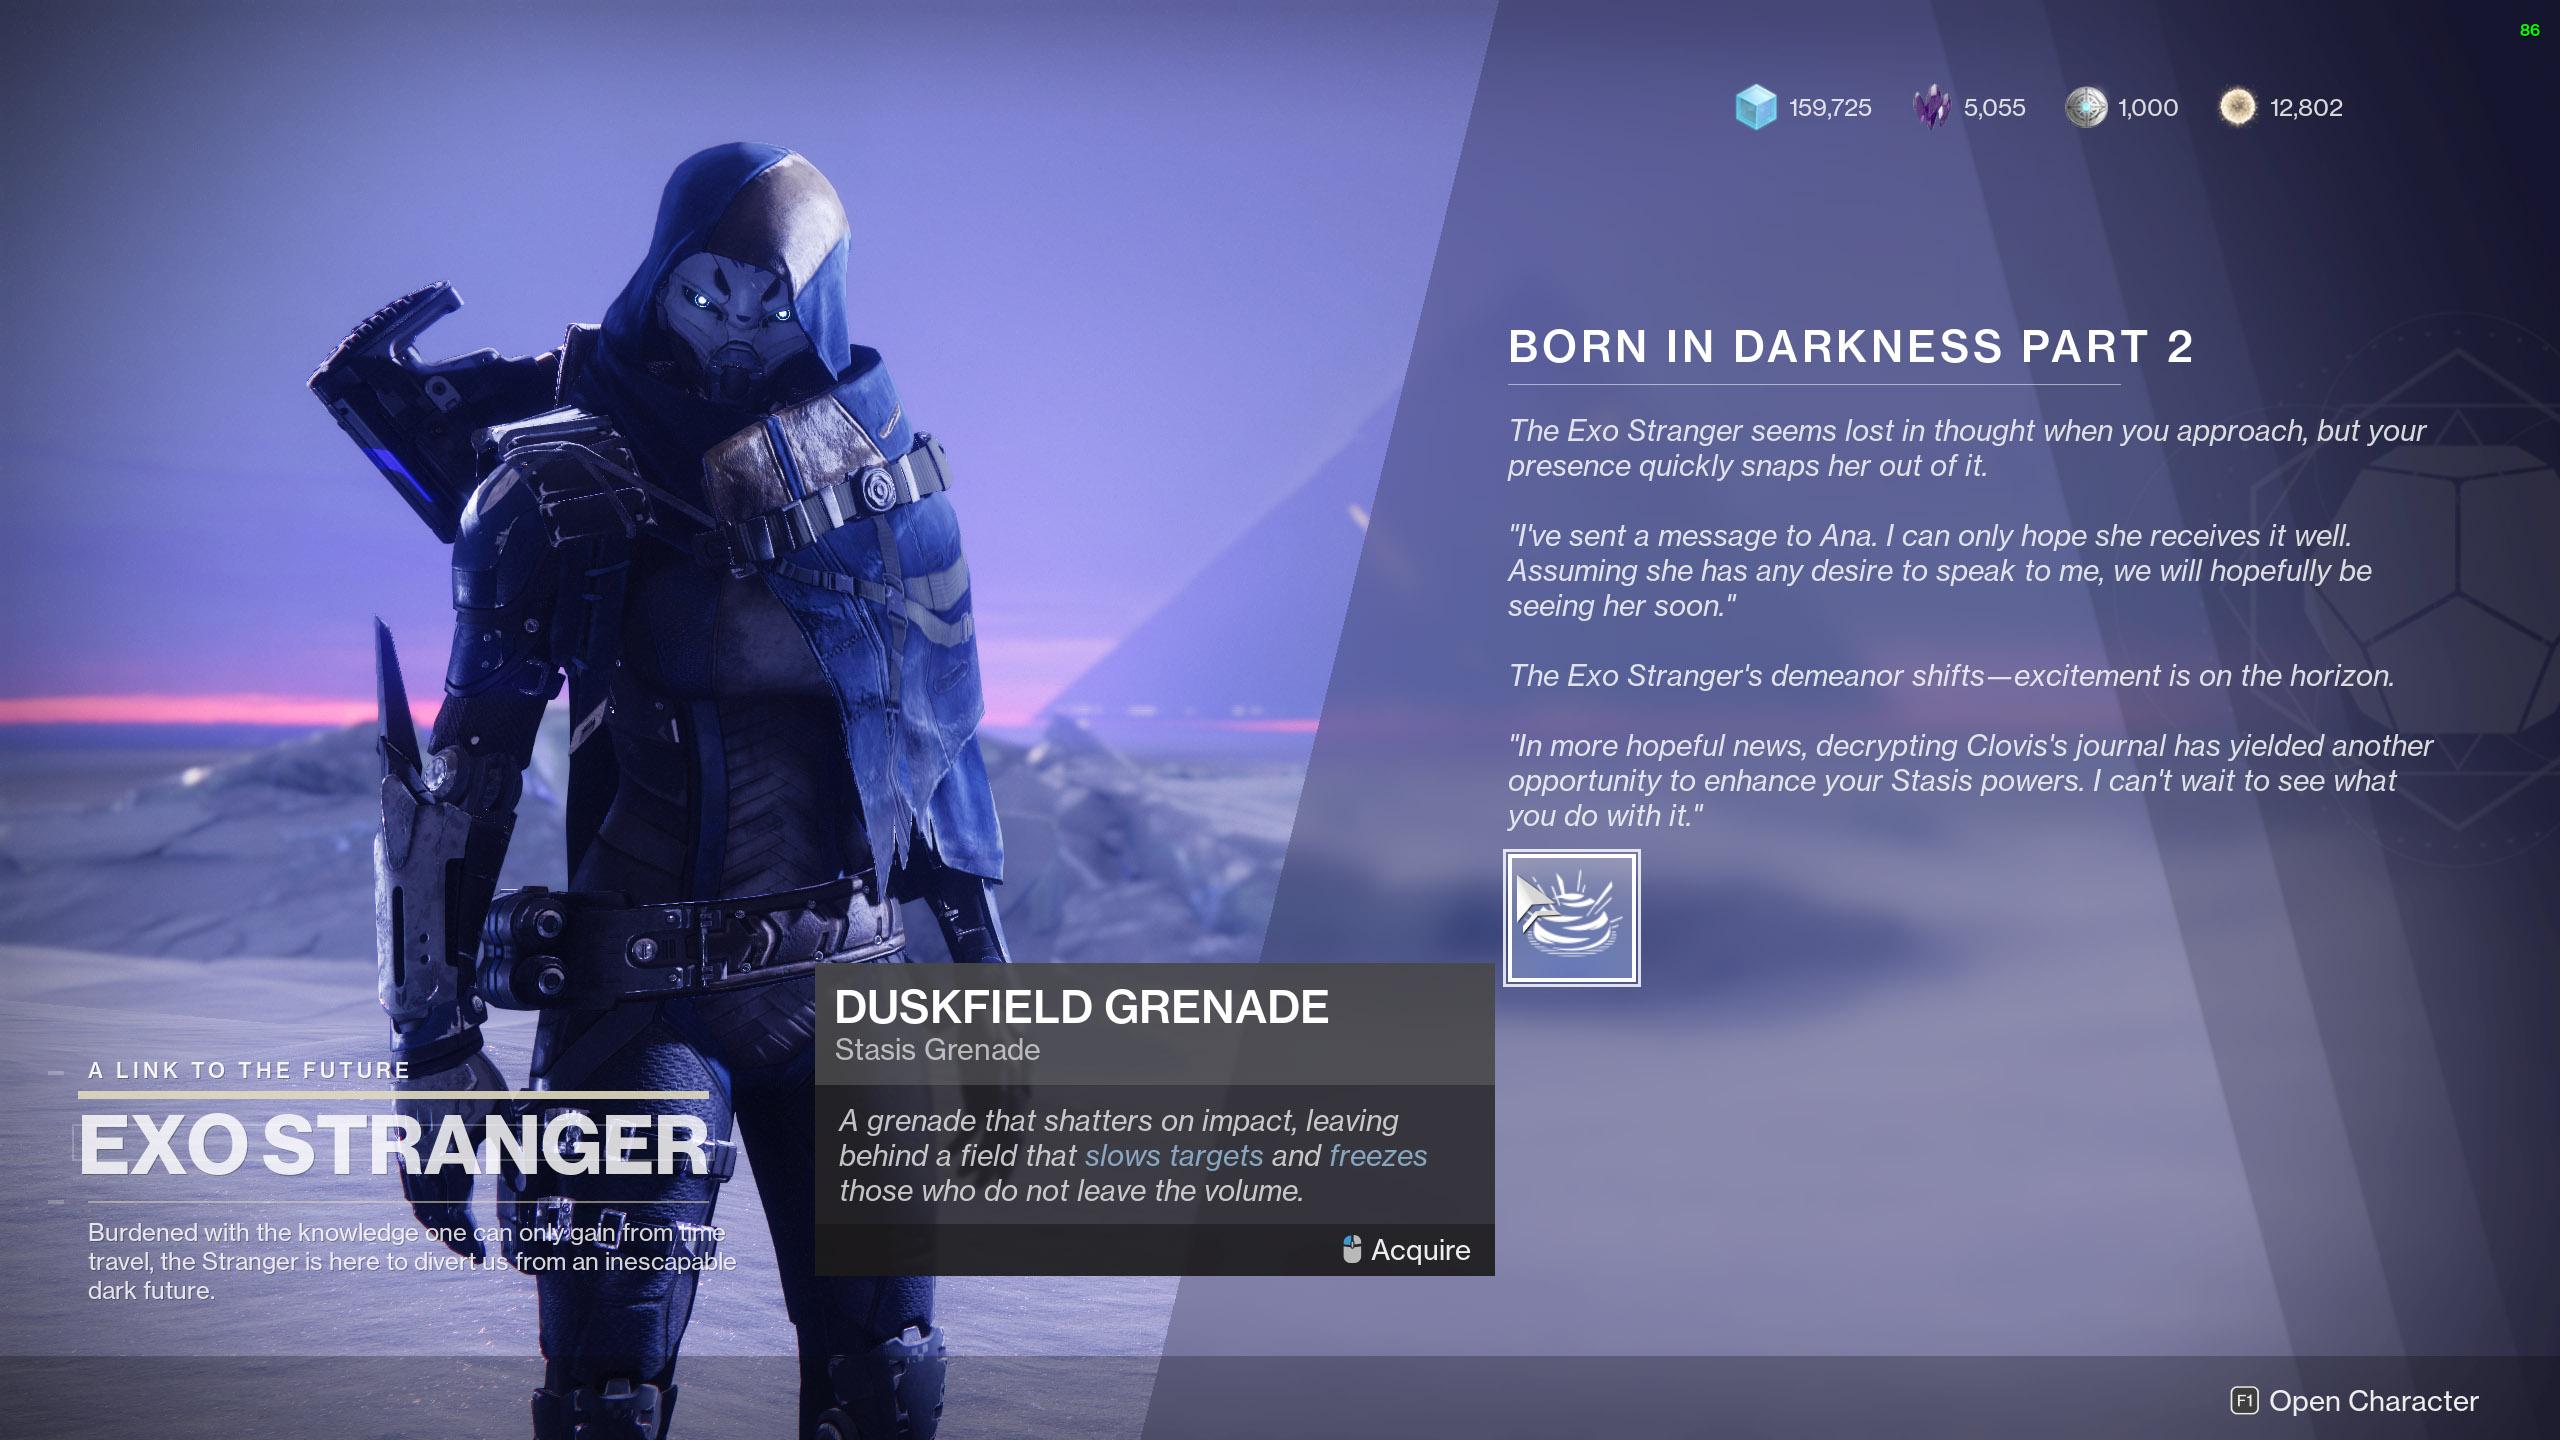 Destiny 2 Born in Darkness Part 2 Граната из Сумеречного поля